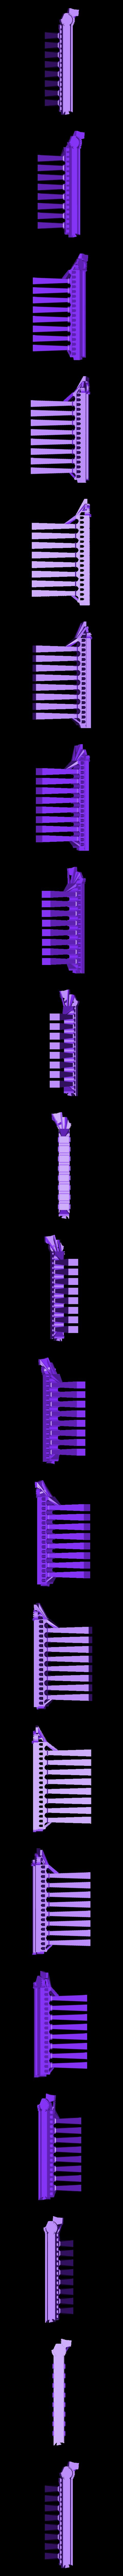 Bridge.stl Download free STL file Hogwarts School of Witchcraft • 3D printer template, Valient